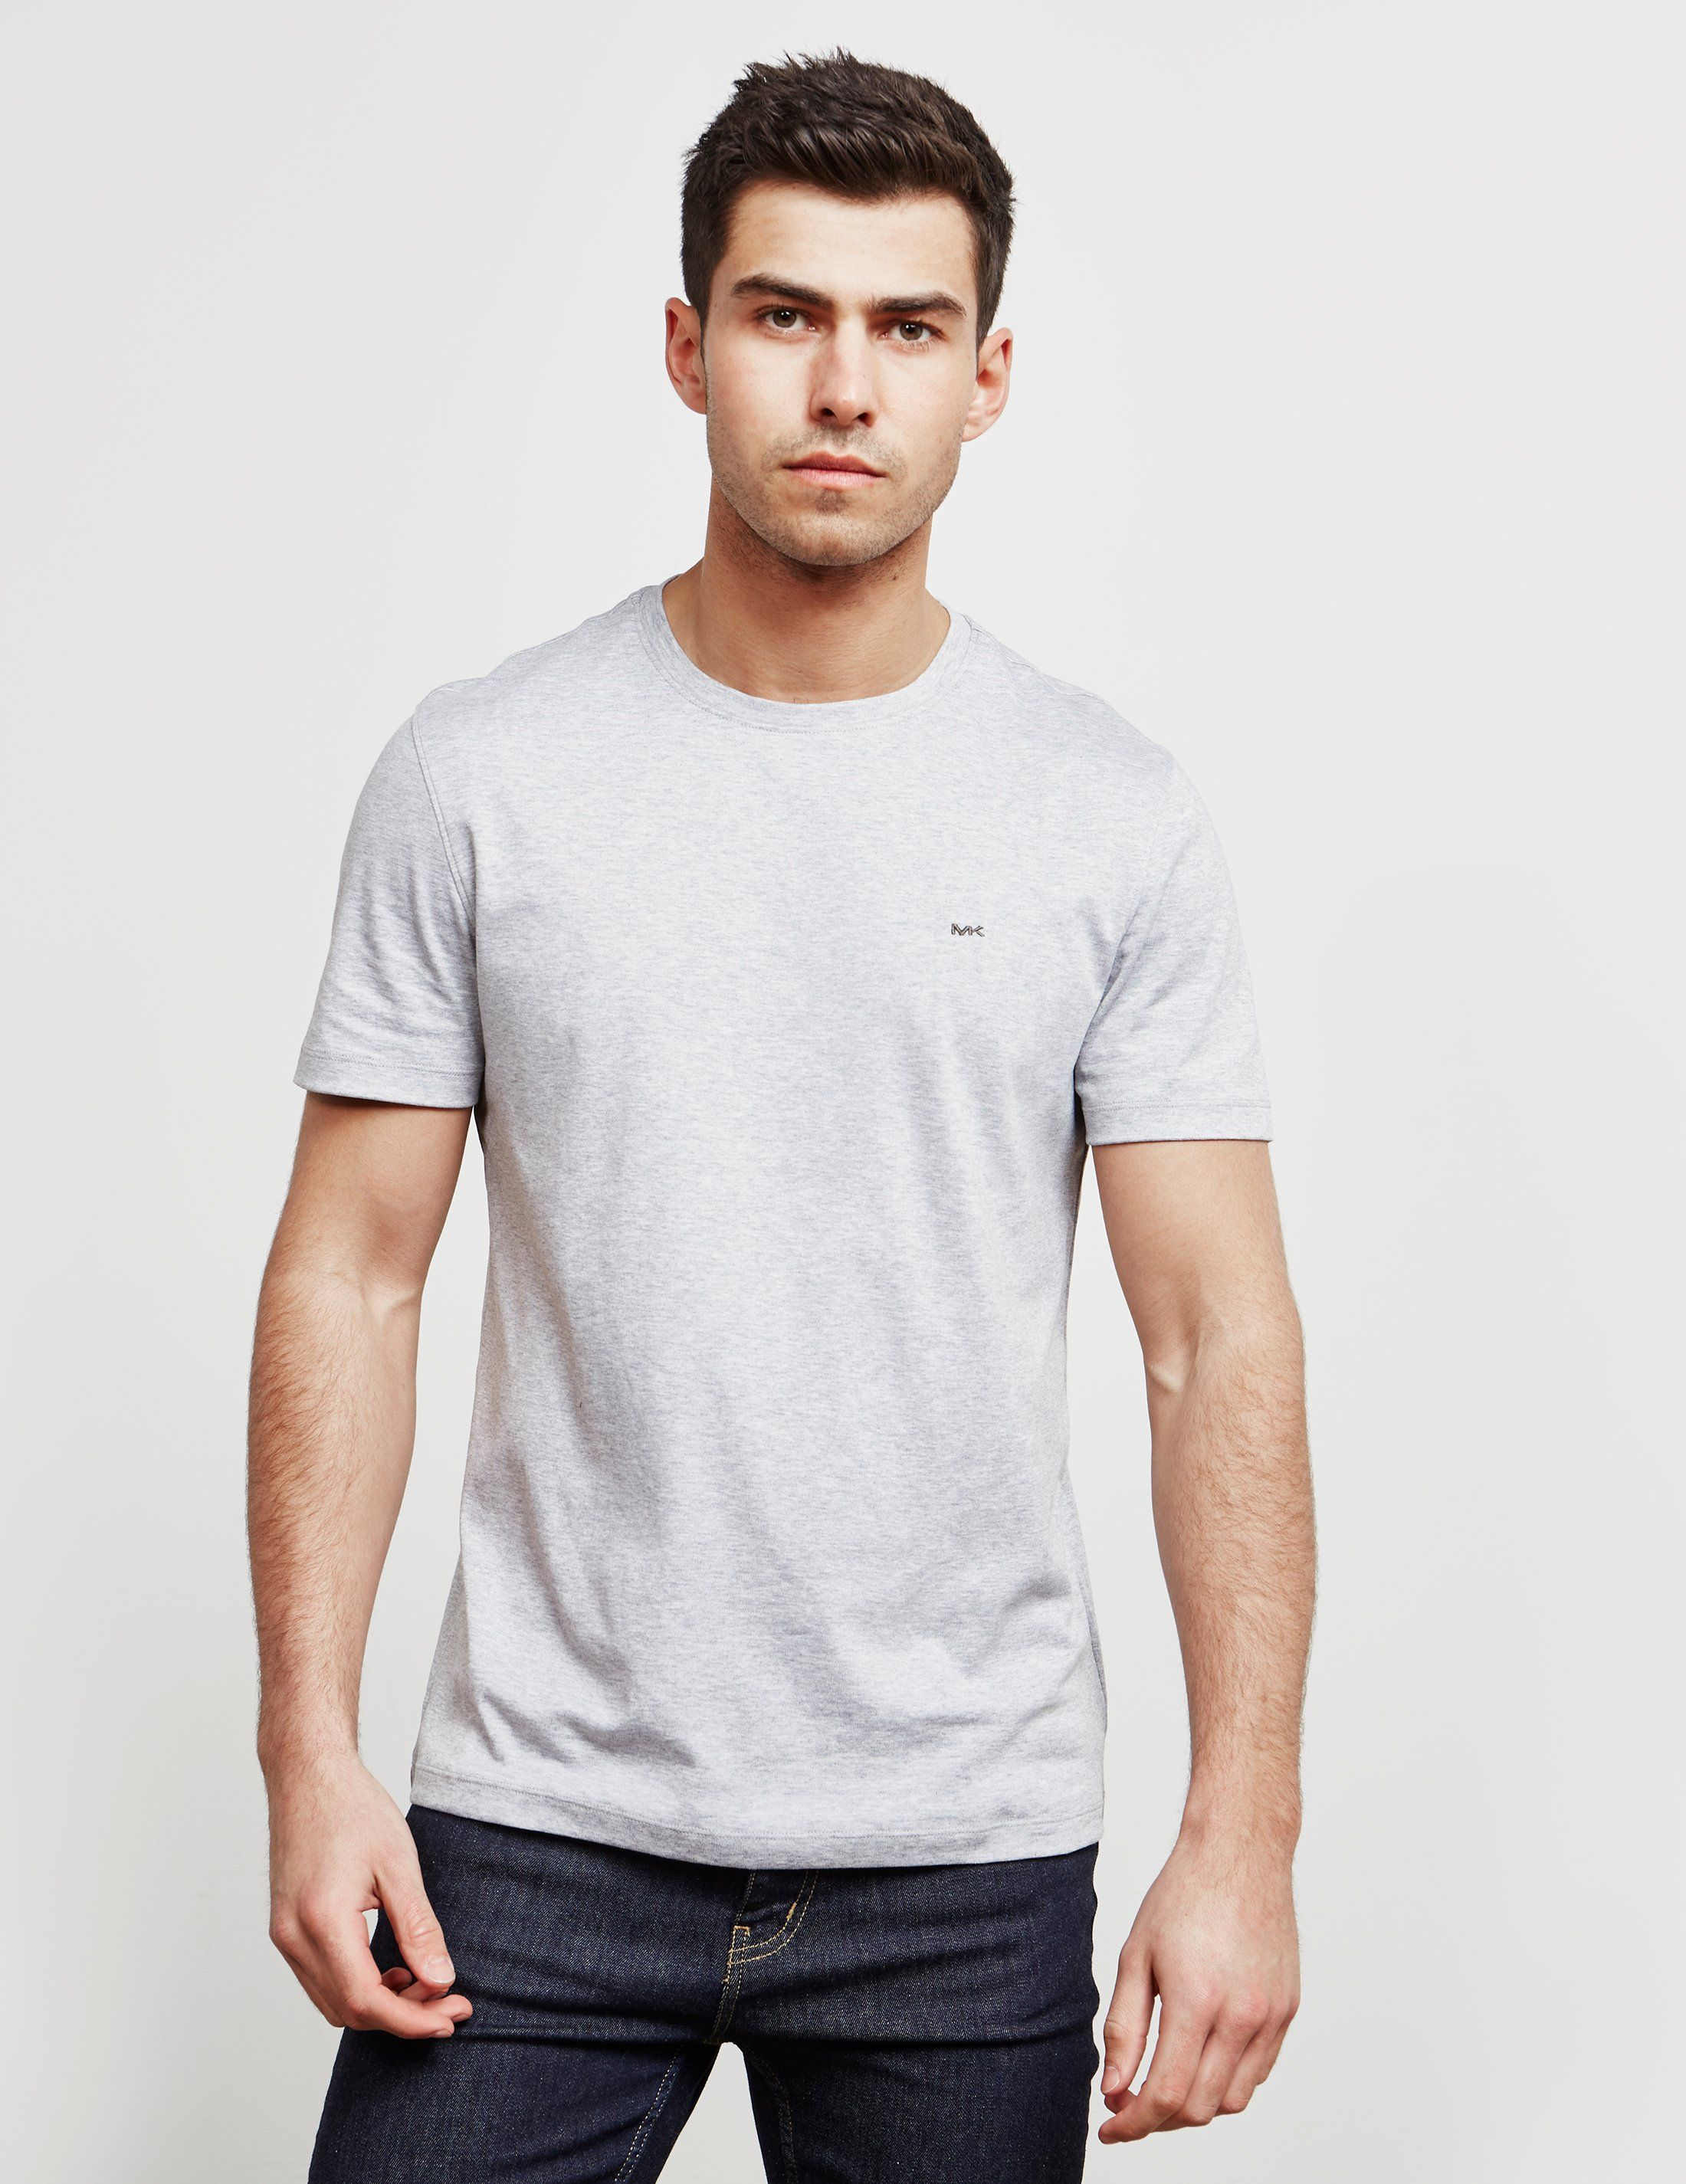 Michael Kors Sleek Crew Short Sleeve T-Shirt